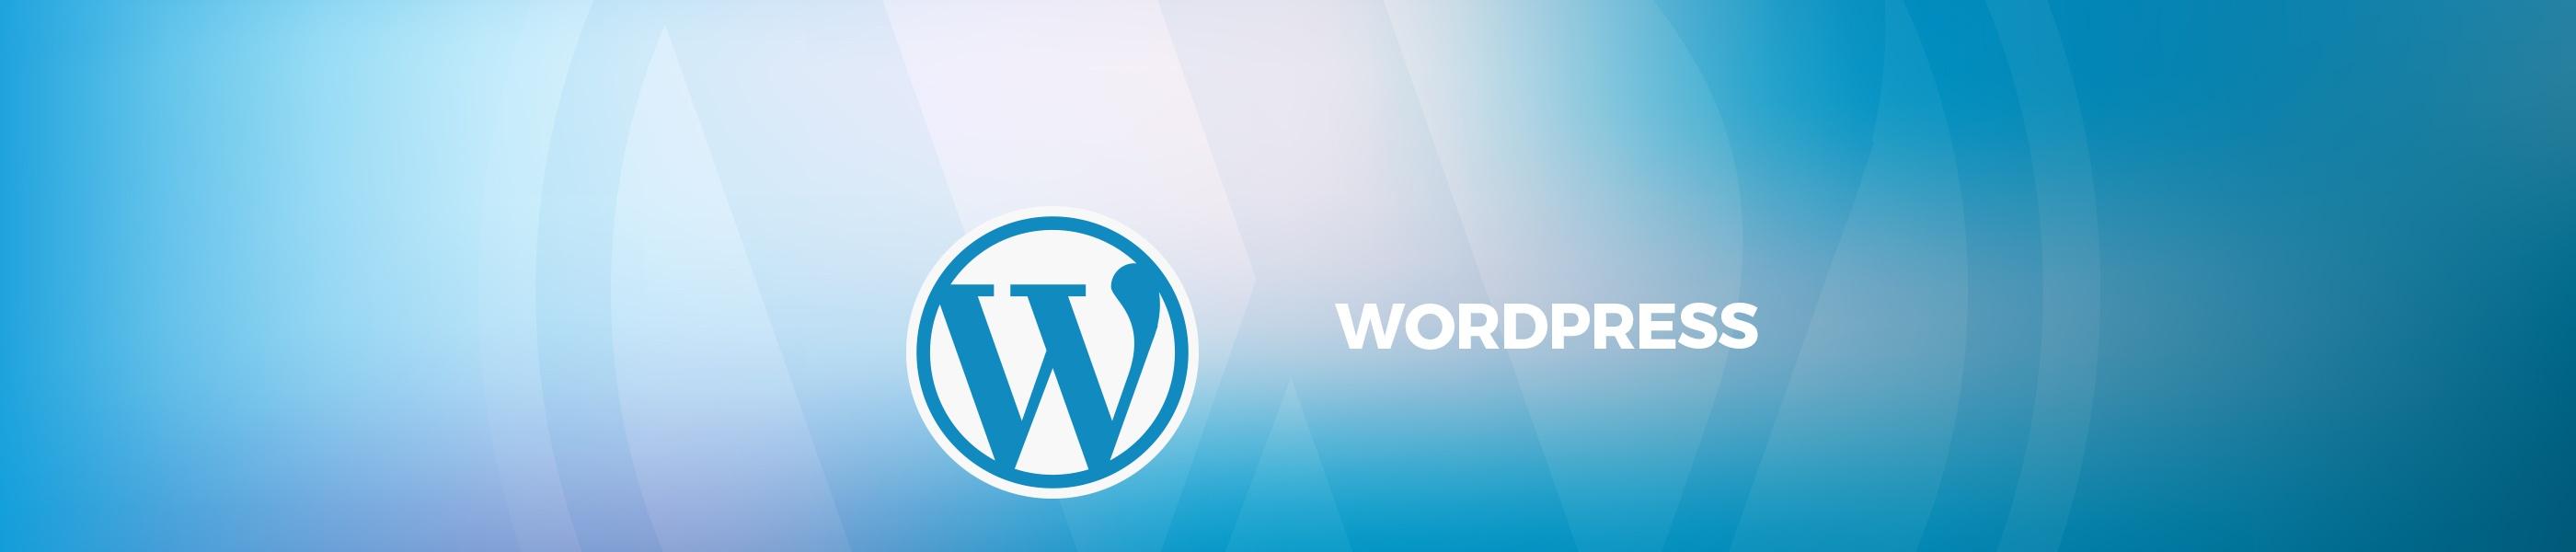 180108_Produkte_wordpress.jpg